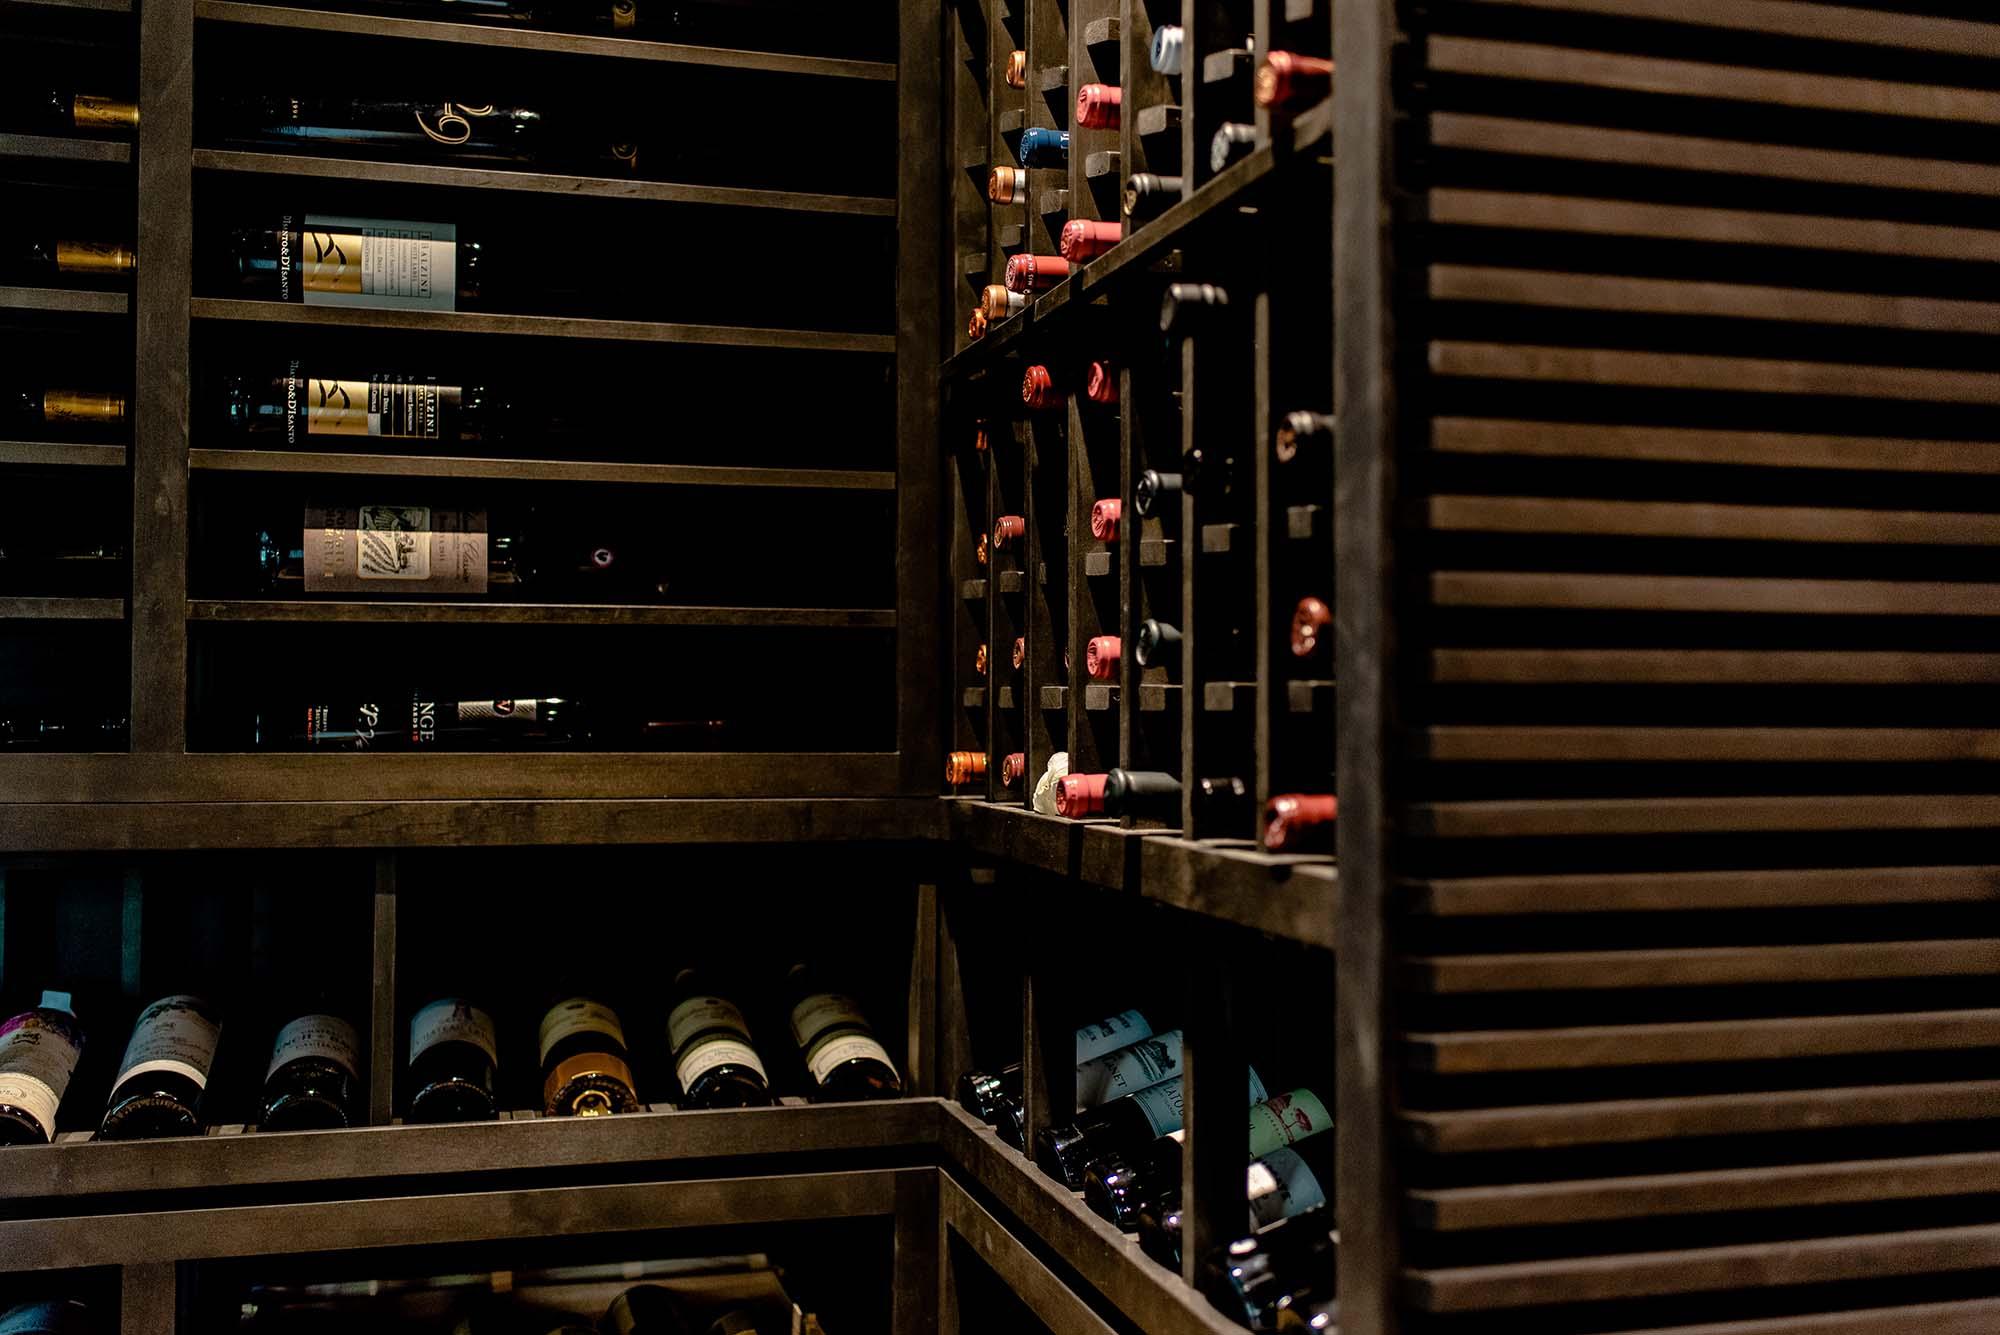 Black Modern Wine Cellar Racks Texas with Stylish Wine Racks